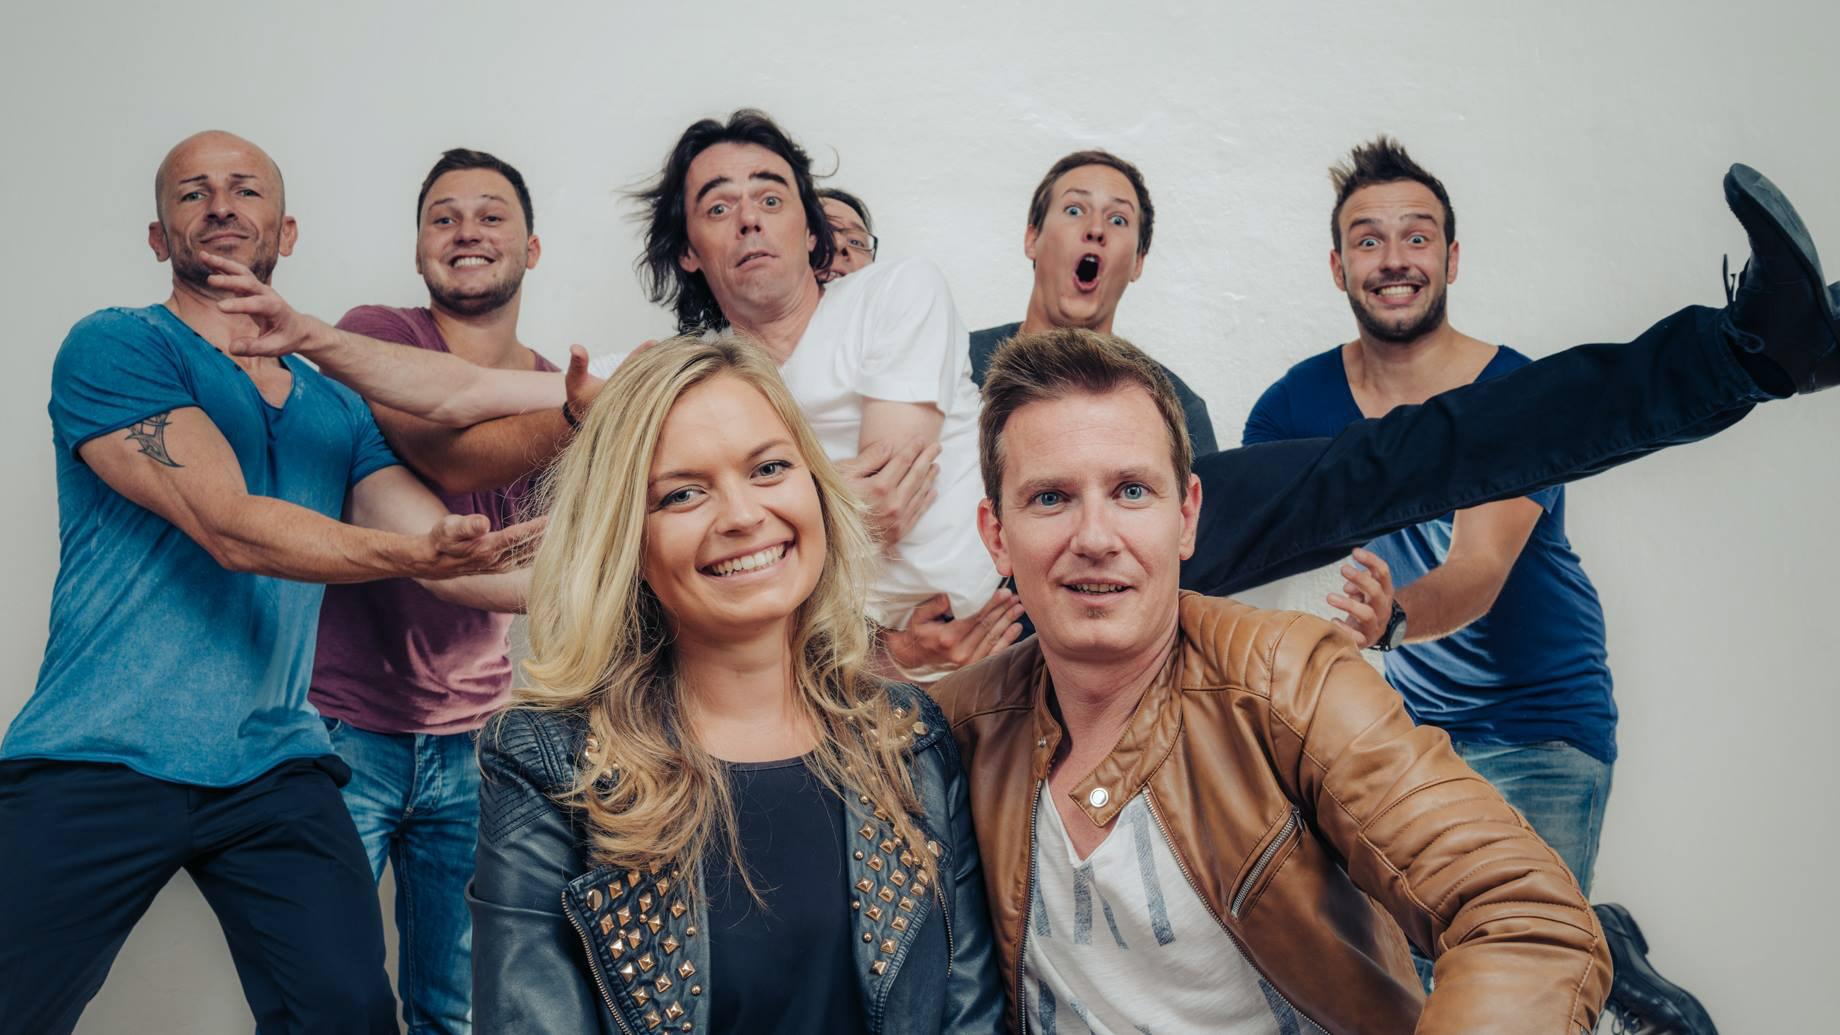 Hochzeitsband Steiermark Izajar Coverband Graz Ballmusik